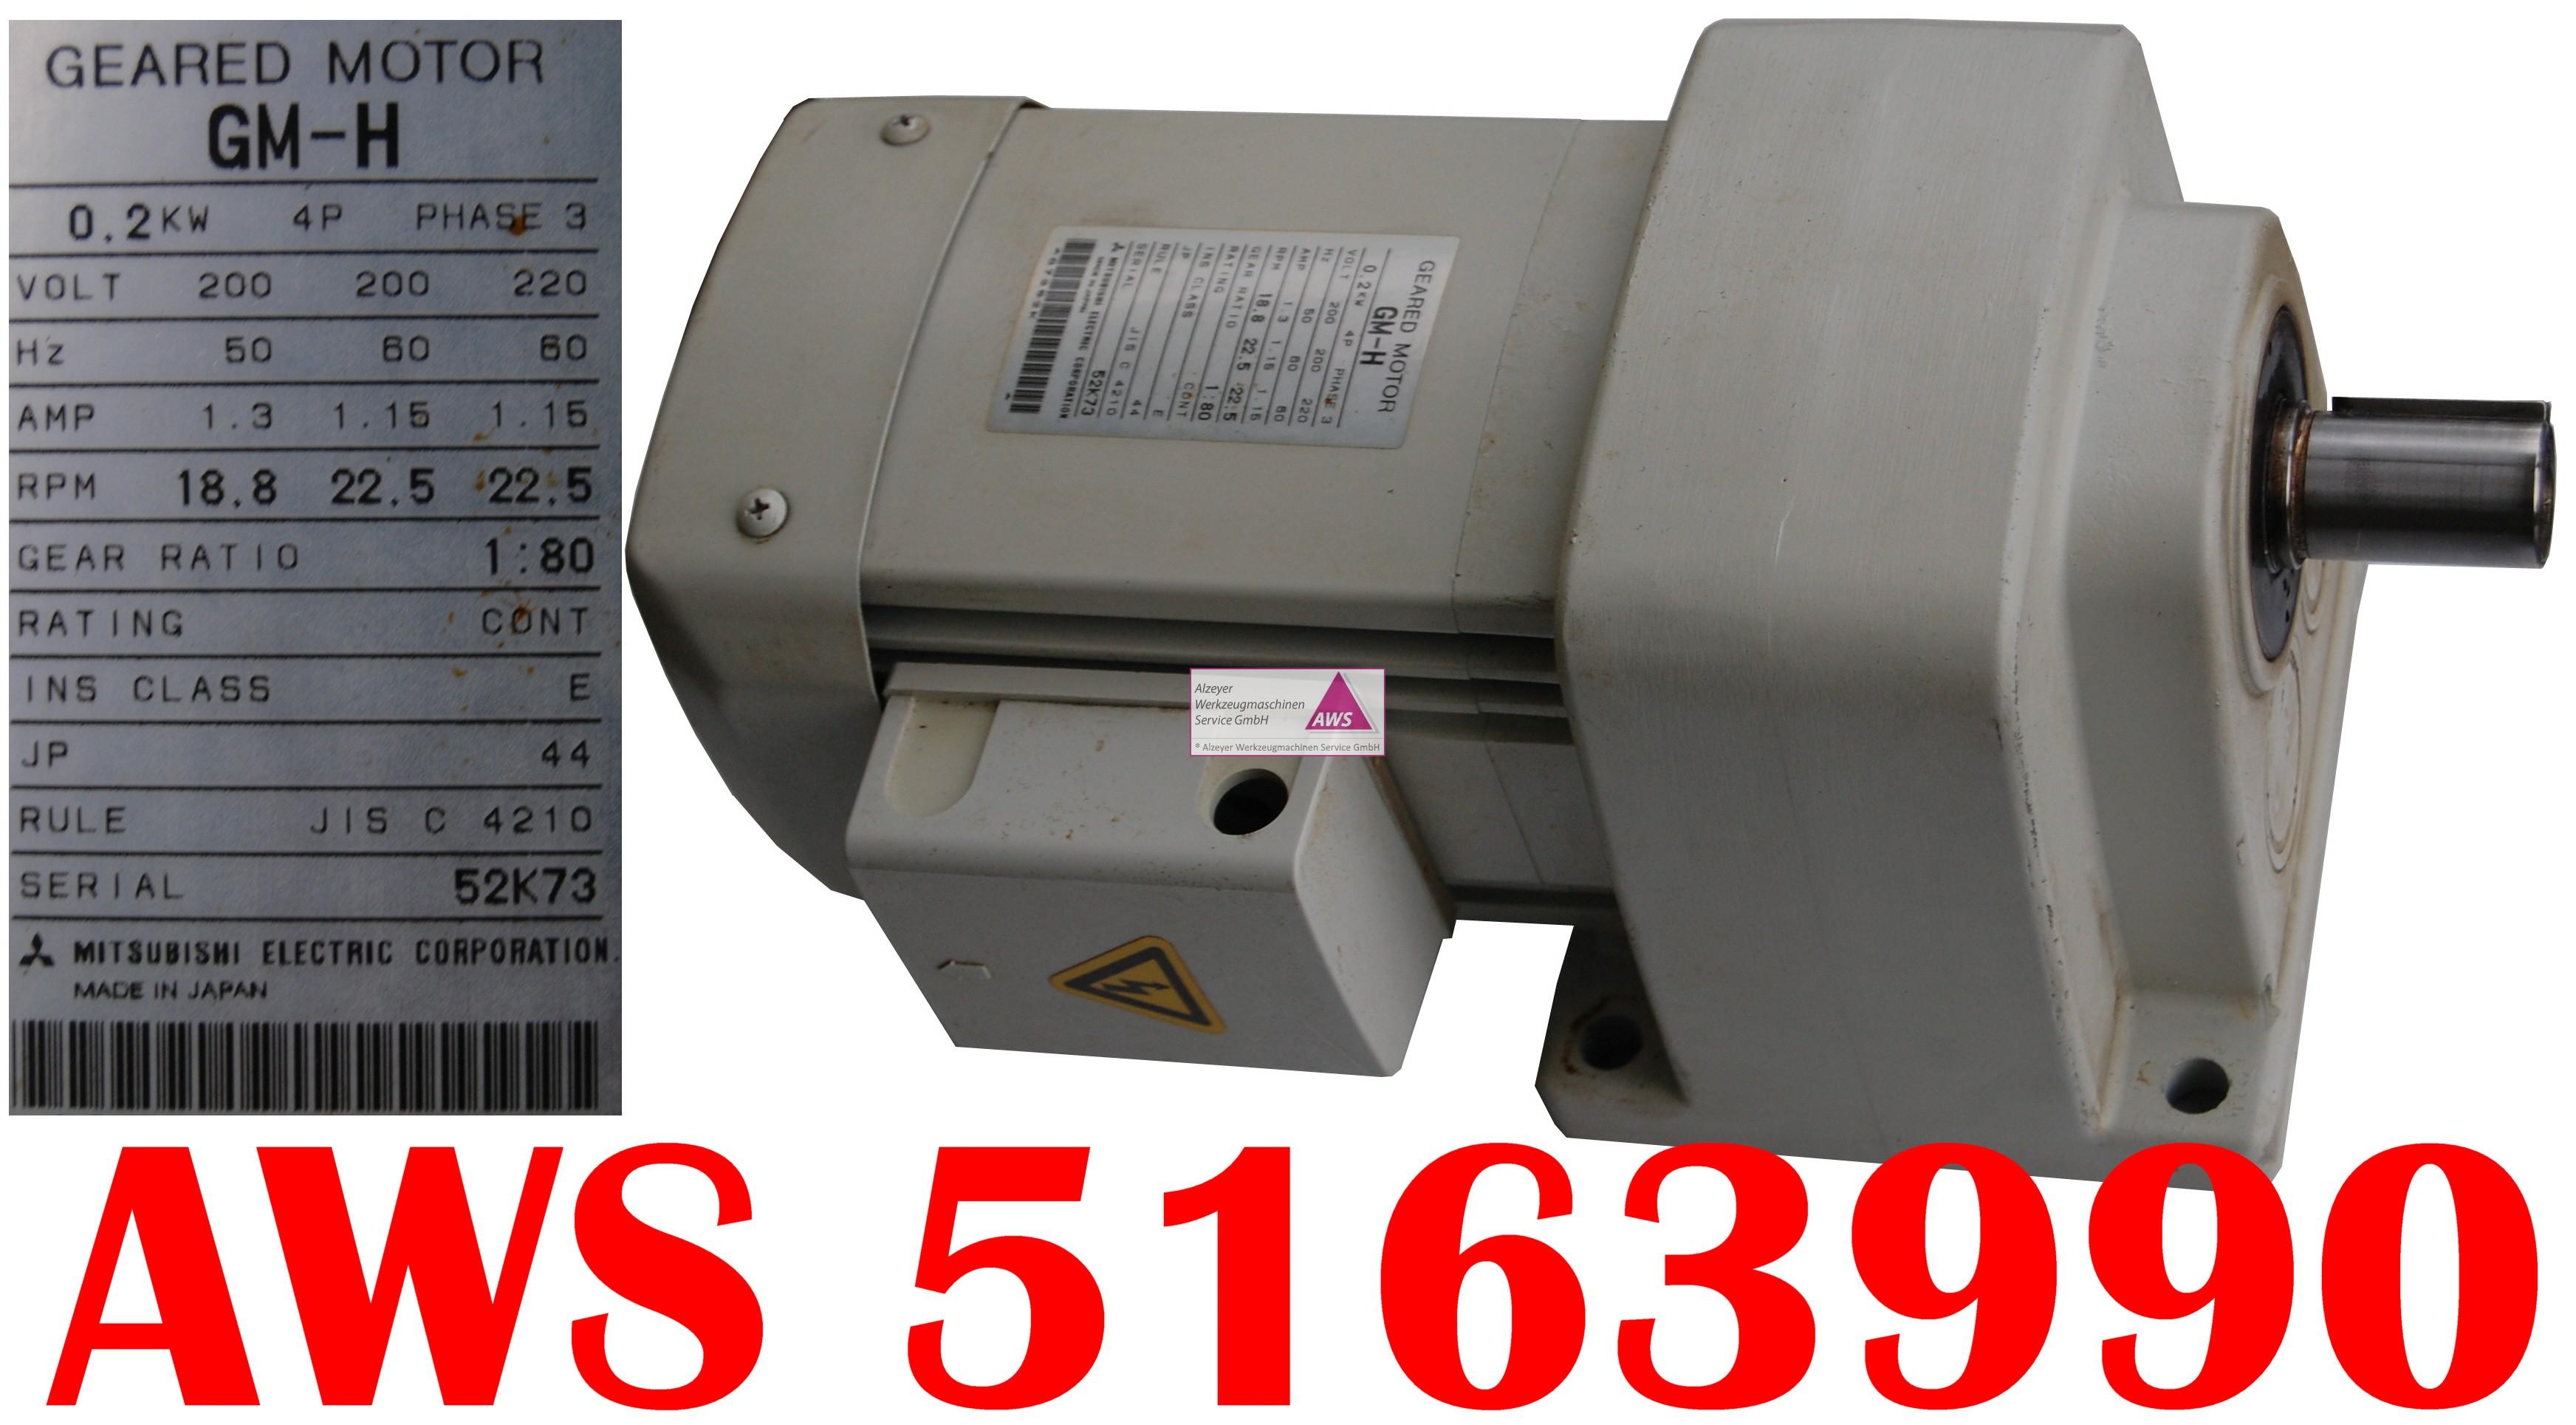 Getriebemotor GM-H 0,2kW